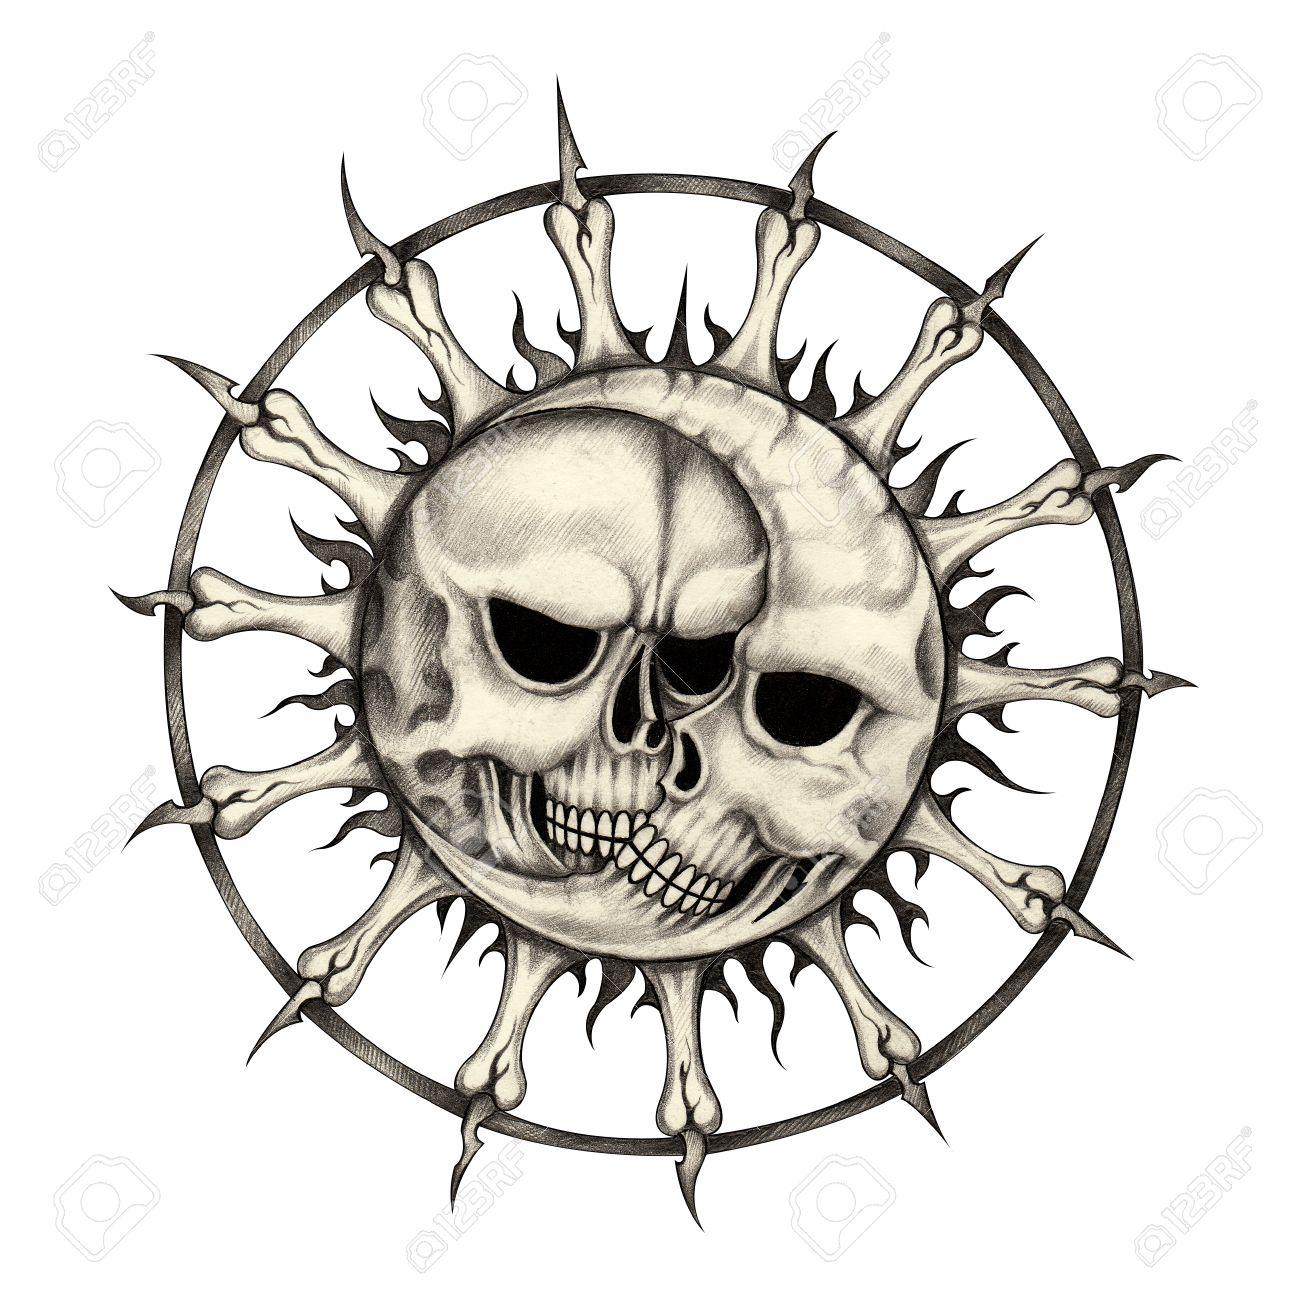 Sol Y Luna Cráneo Tattoohand Dibujo A Lápiz Sobre Papel Fotos